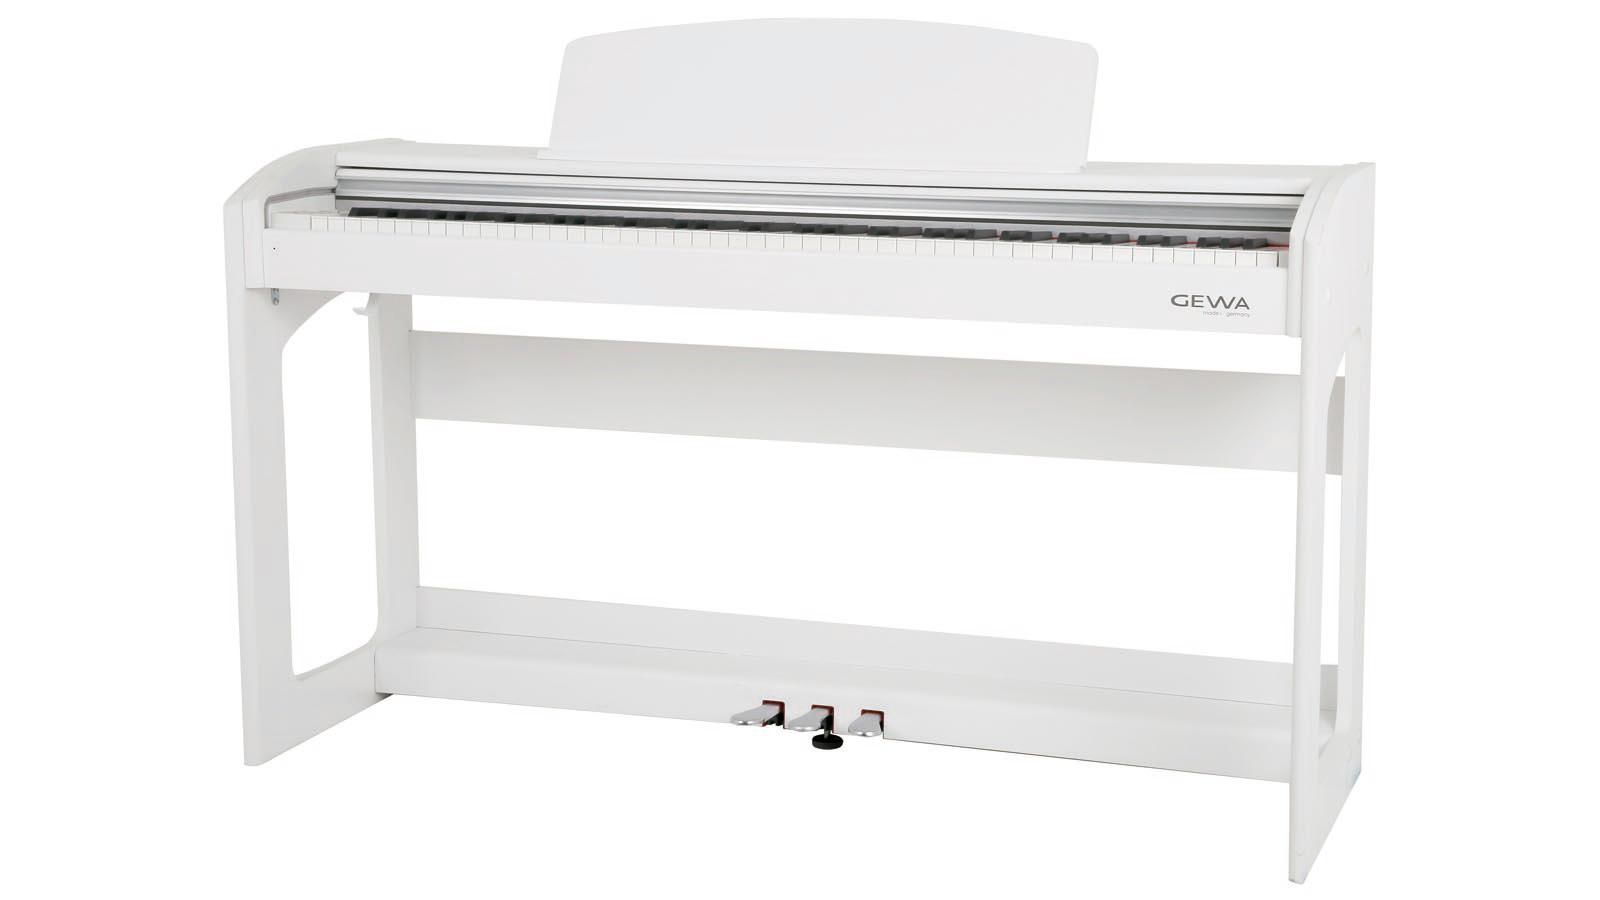 Gewa DP340G WH E-Piano weiß matt